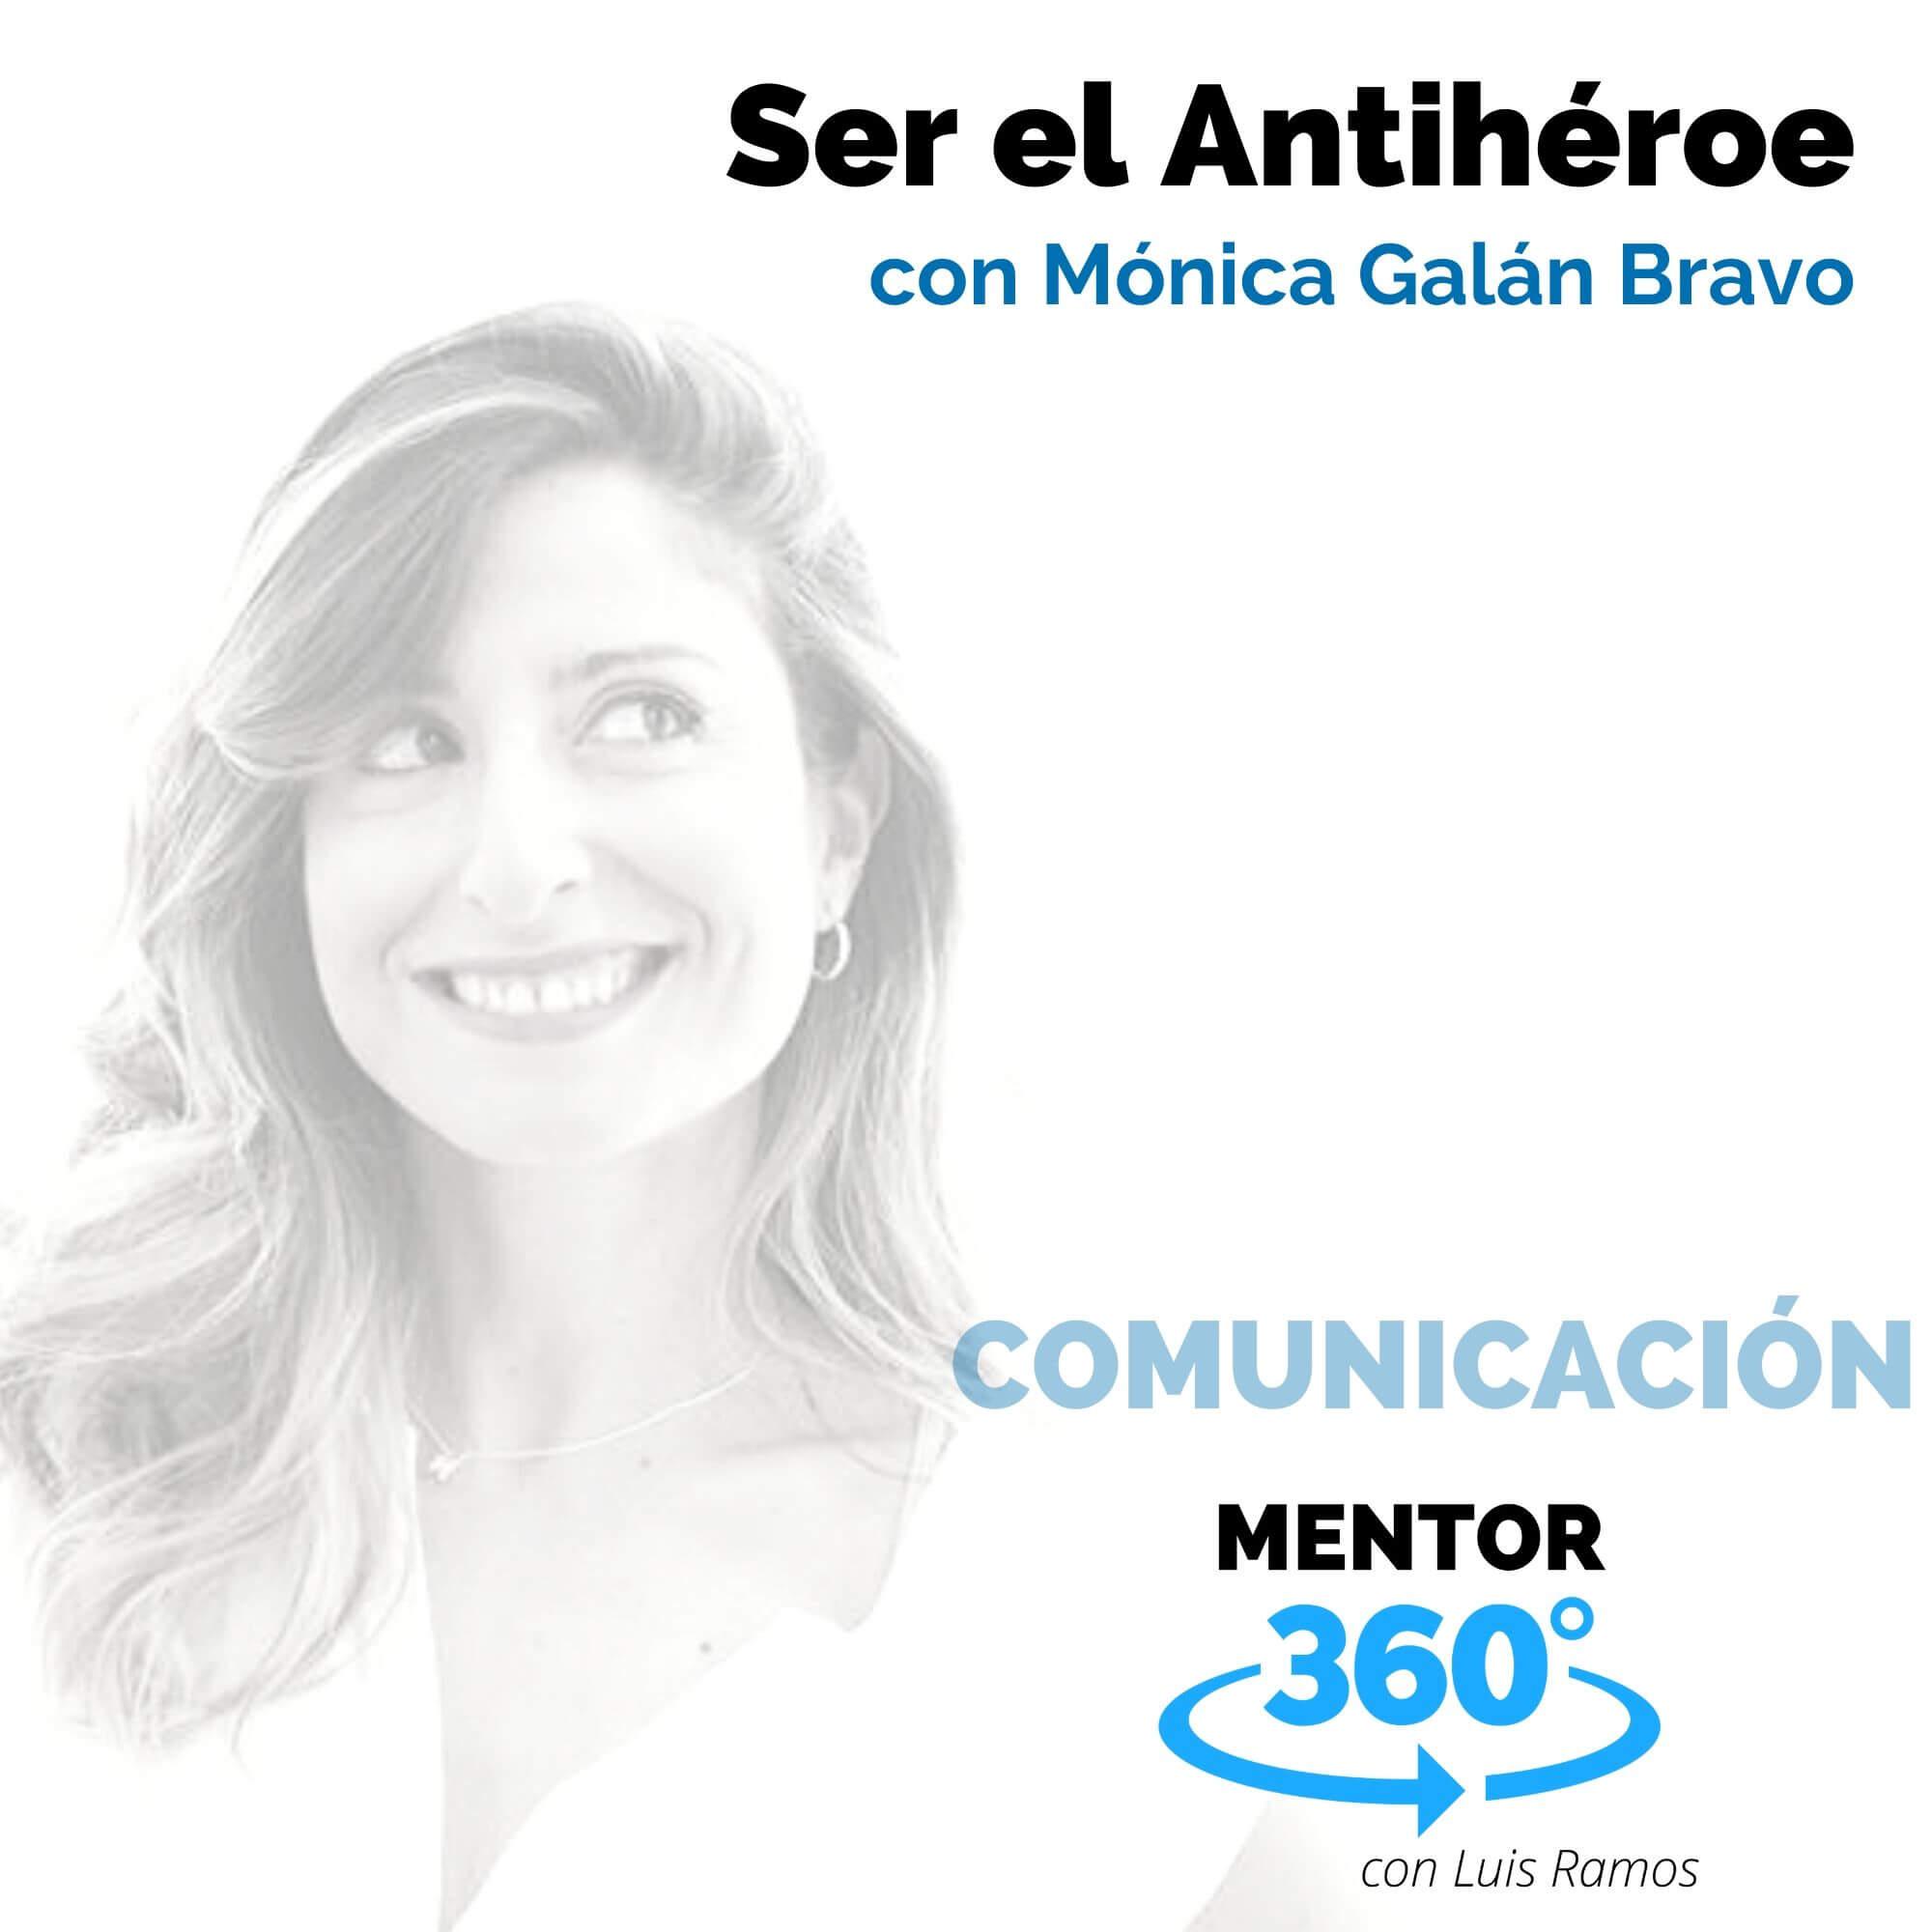 Ser el Antihéroe, con Mónica Galán Bravo - COMUNICACIÓN